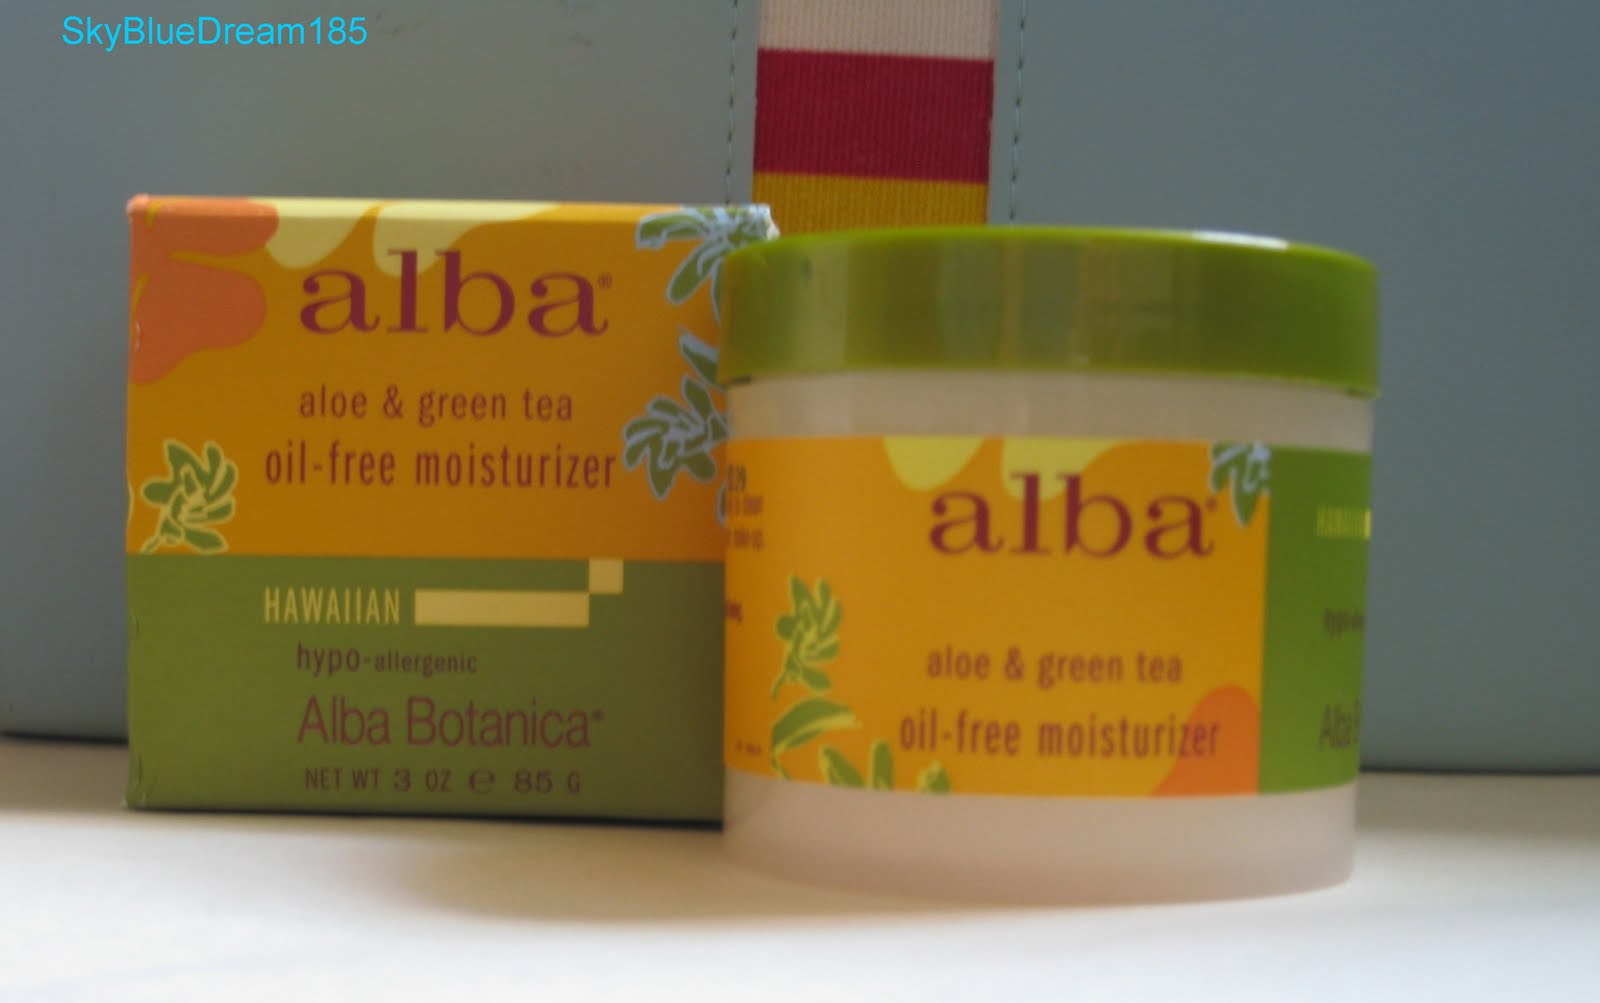 Alba botanica oil free moisturizer